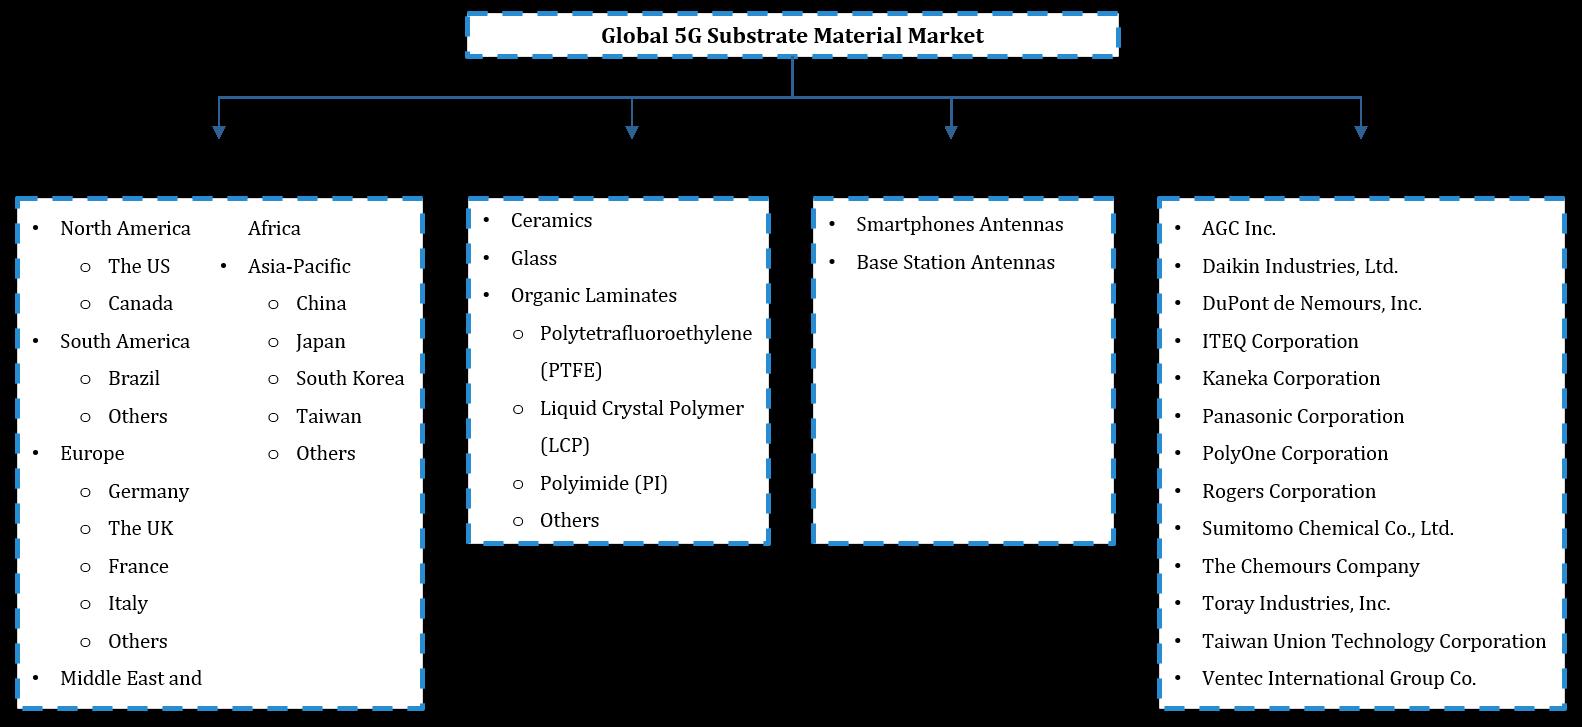 Global 5G Substrate Market Segmentation